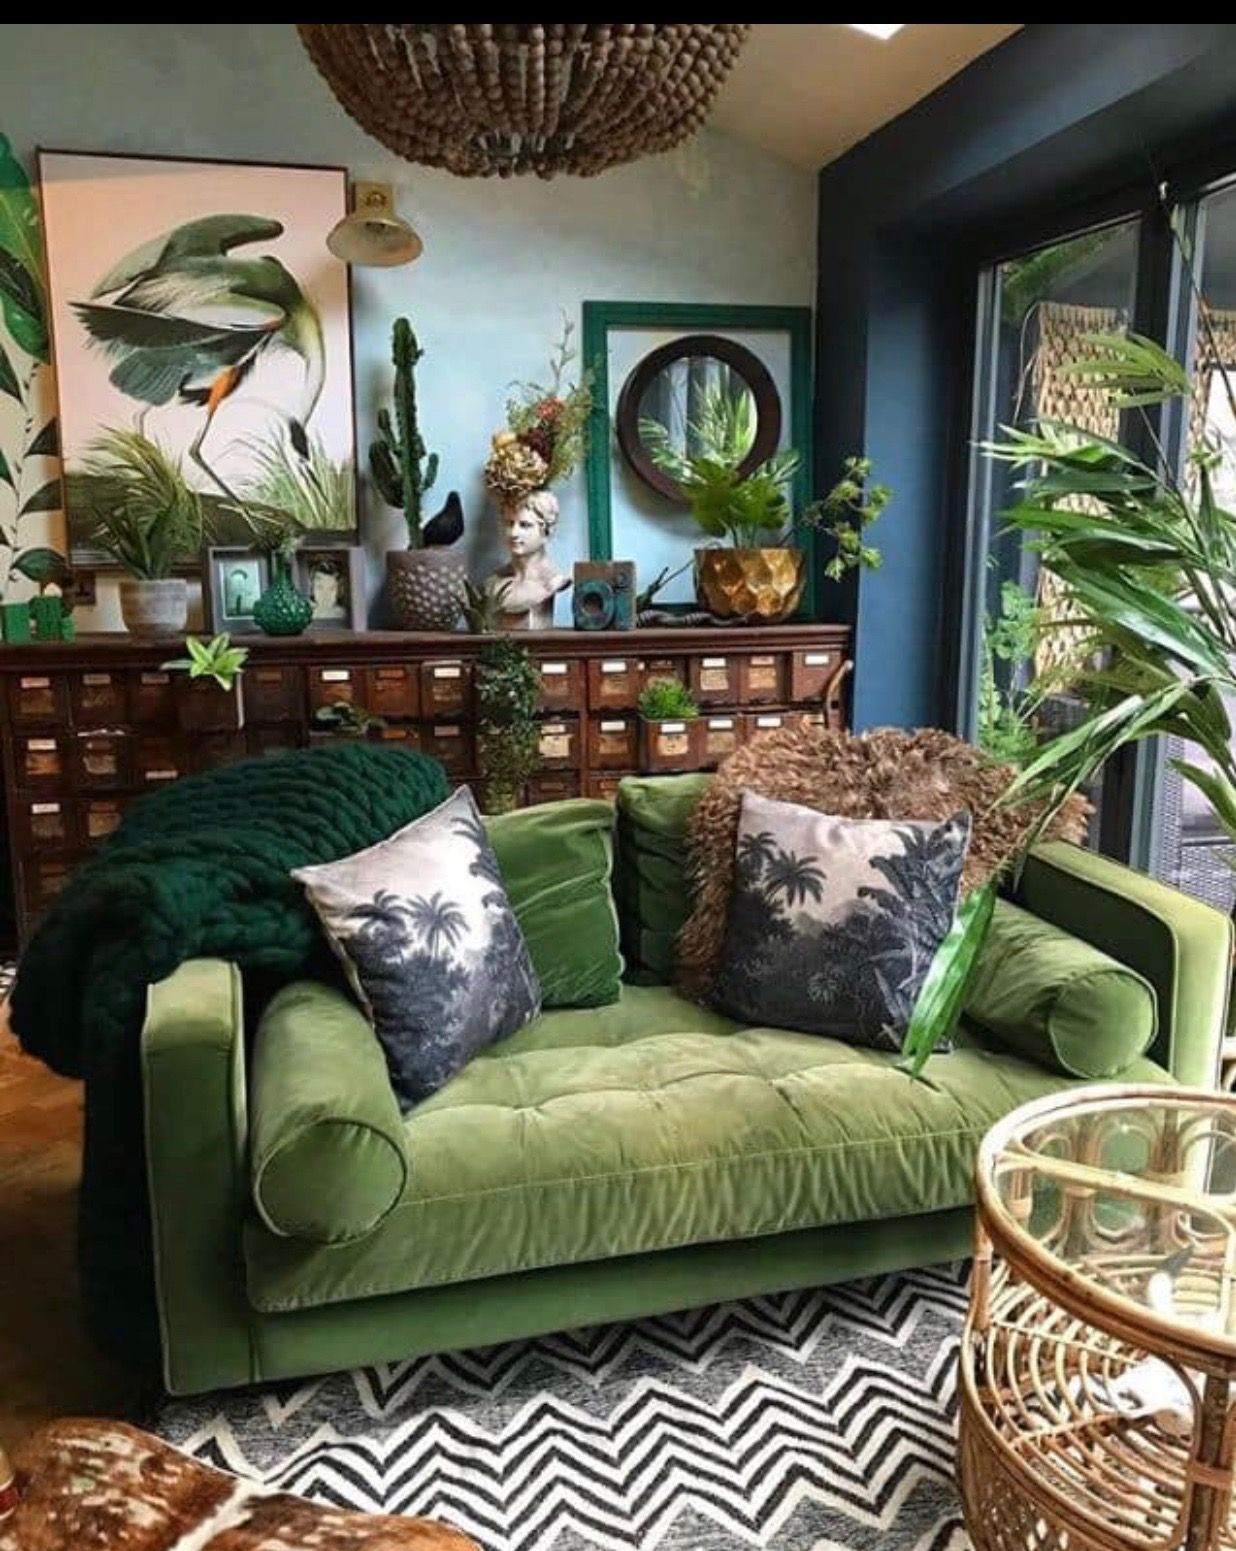 Living room interior design green sofa love seat dark